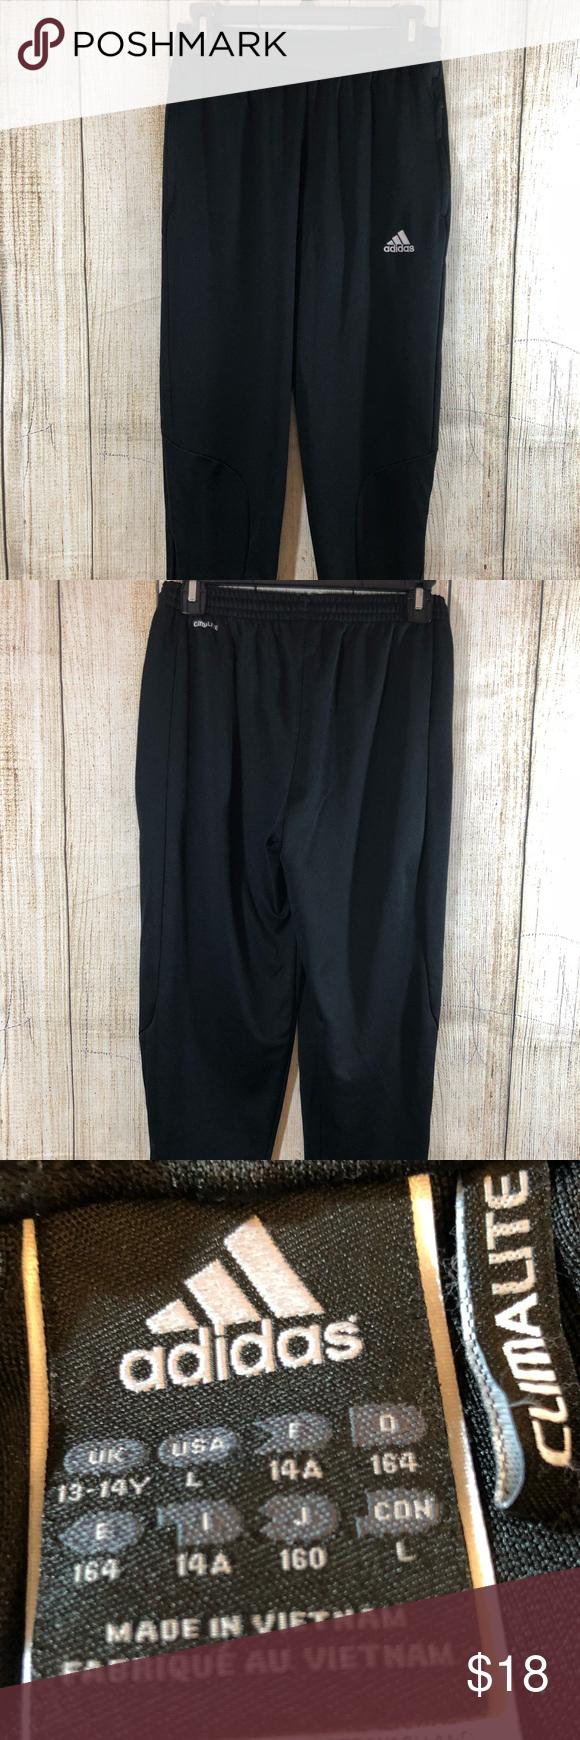 pérdida junio creativo  adidas rn 88387 ca 40312 pants| flash sales |www.foundationschoolpatna.com